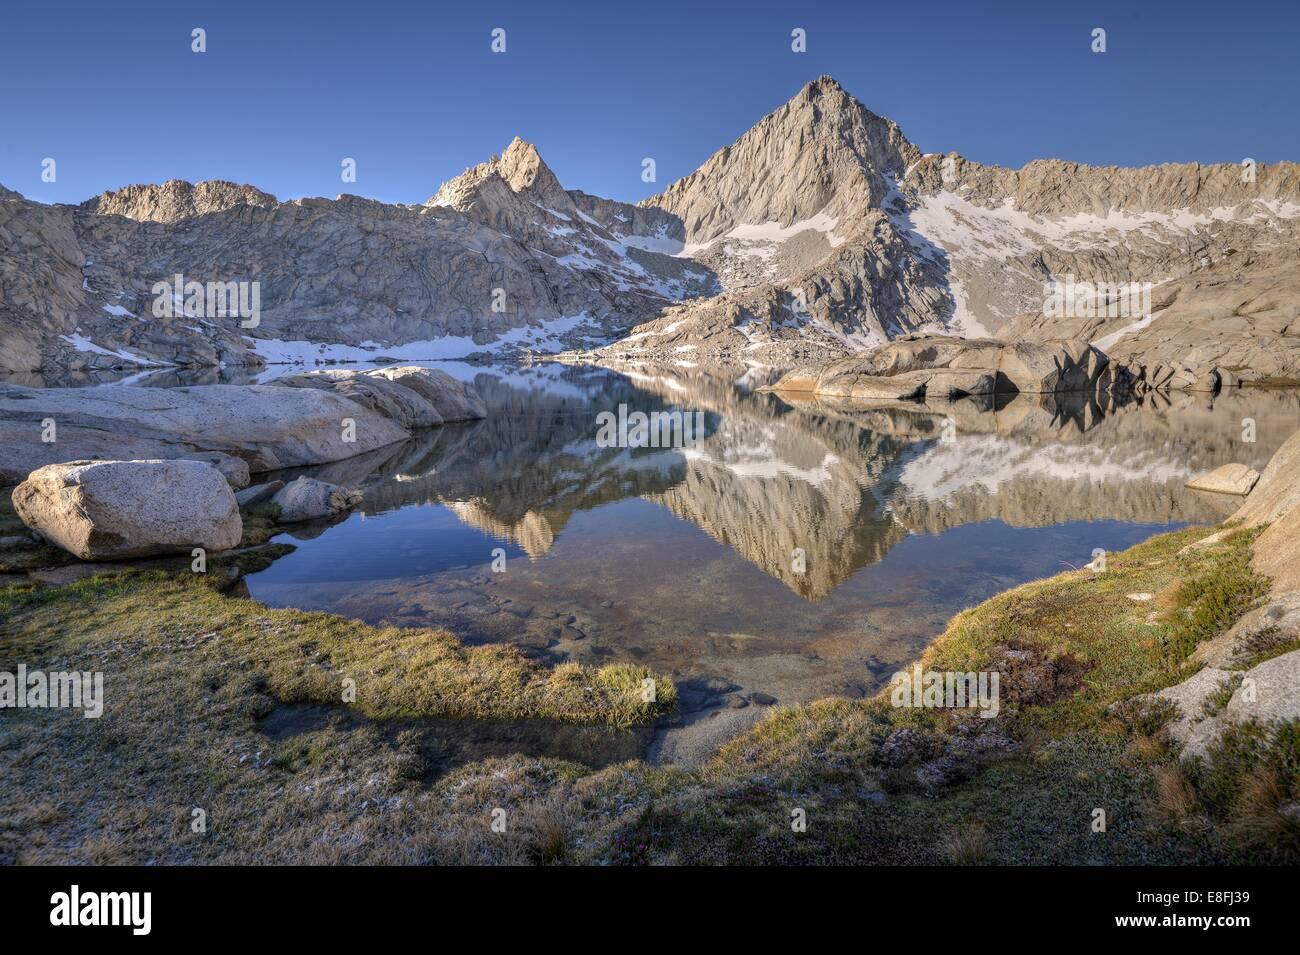 USA, California, Sequoia National Park, Sawtooth Peak reflected in Columbine Lake - Stock Image